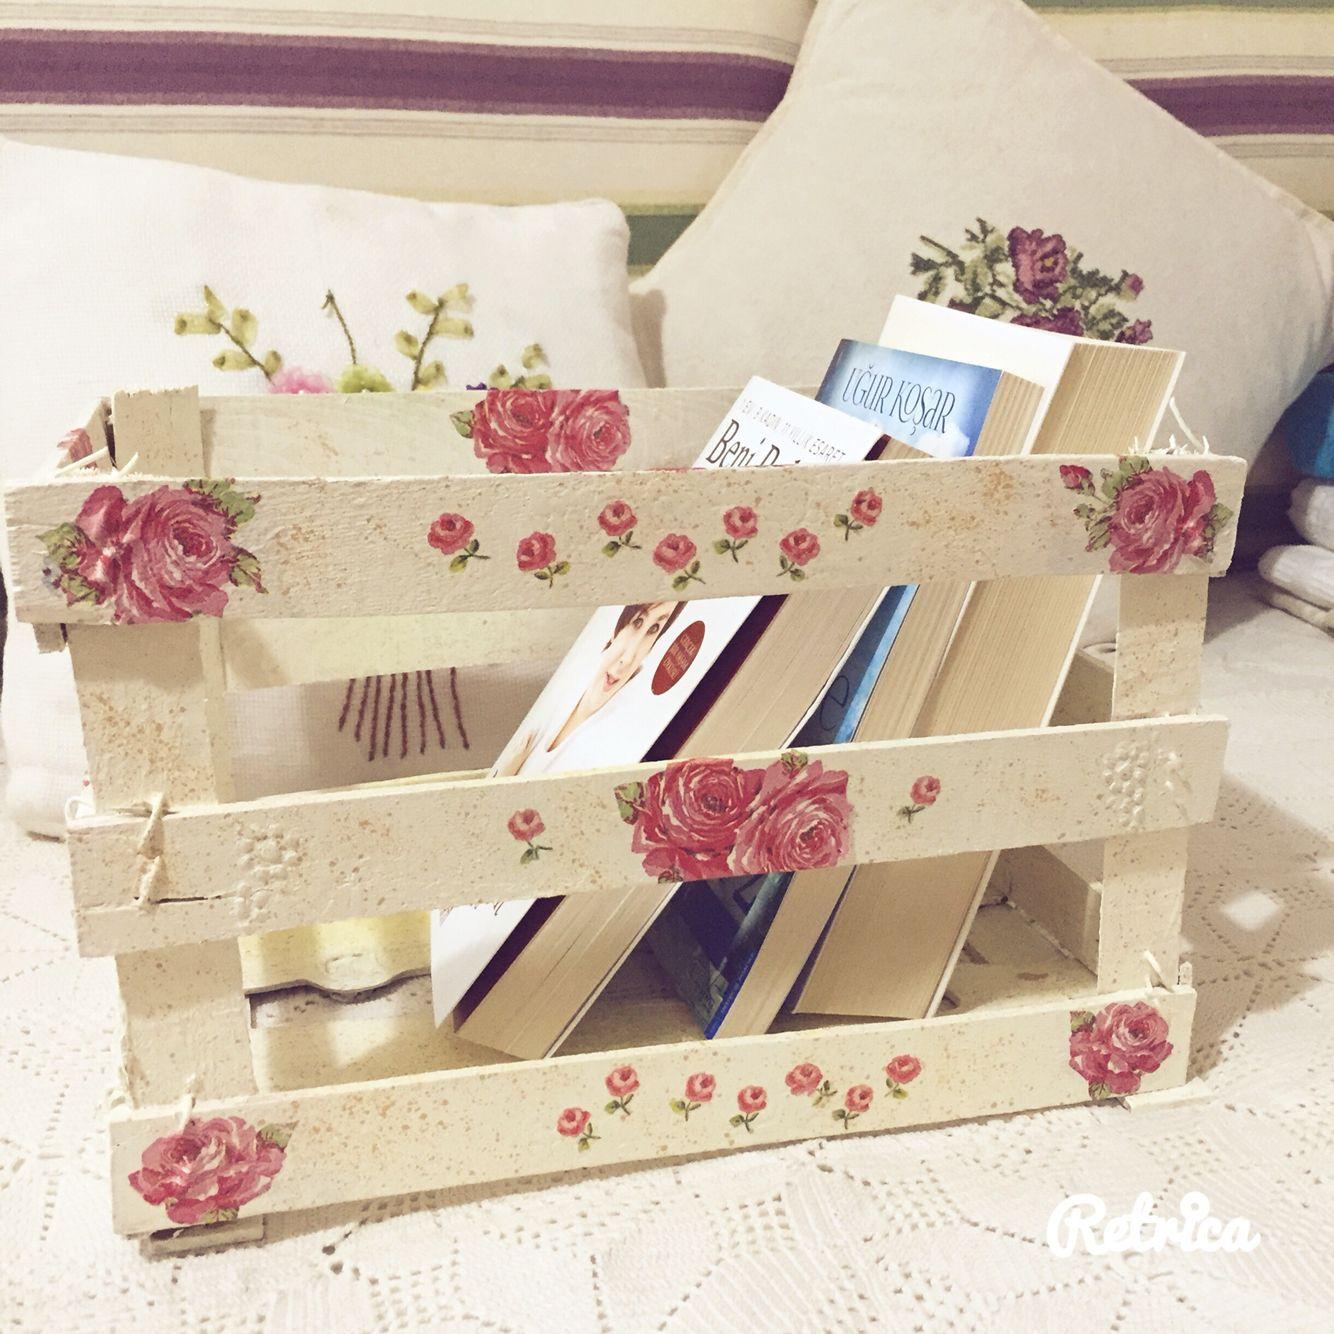 Kasa Ahsap Boyama Wood Woodpaint Manualidades Manualidades En Tela Cajas